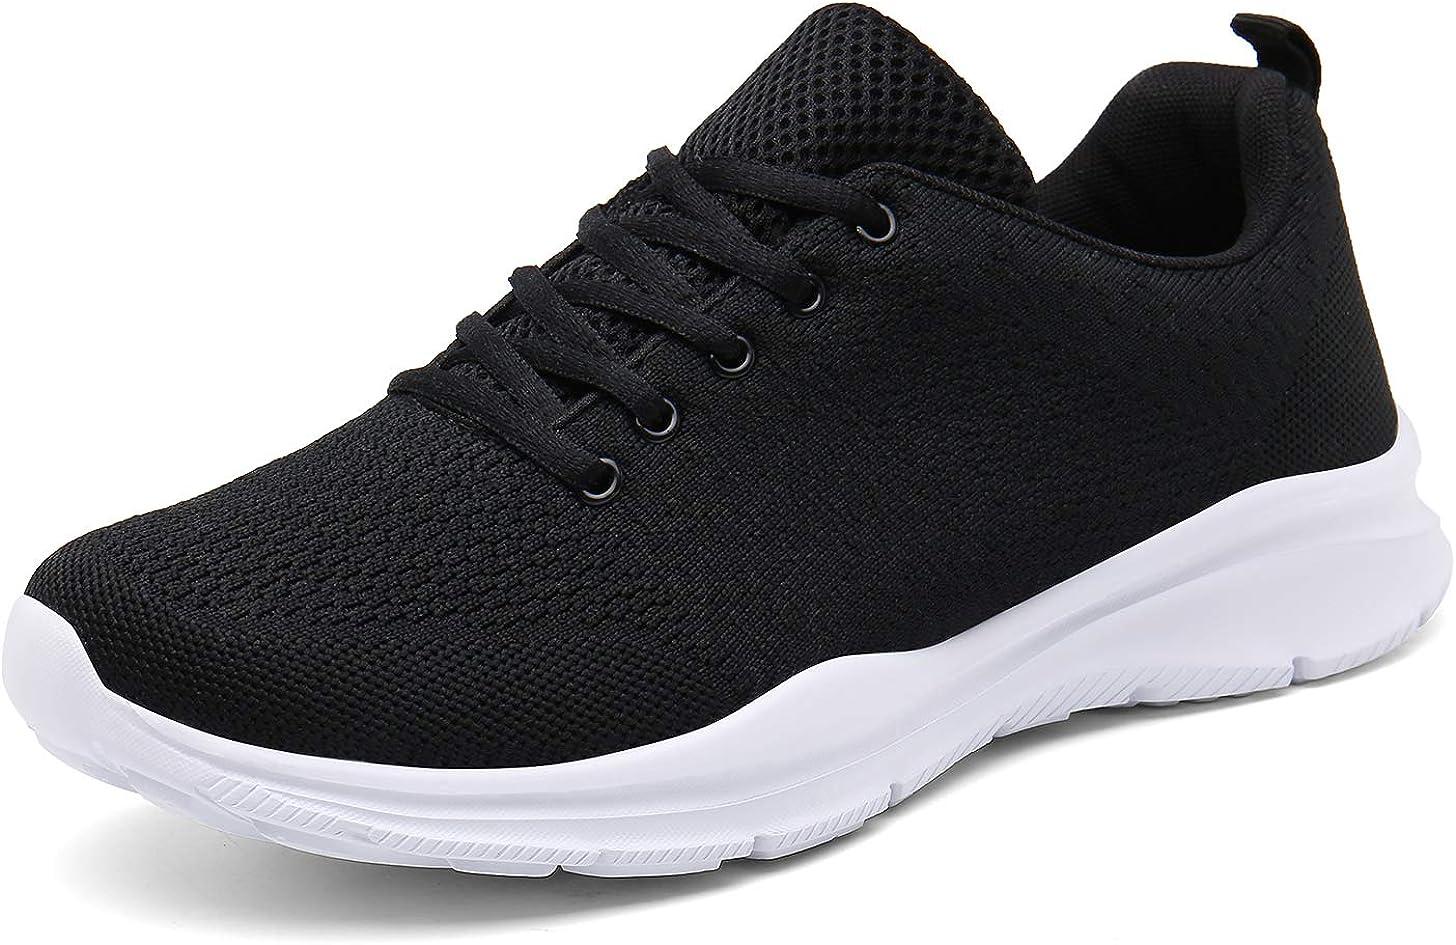 DAFENP Femme Baskets Mode Chaussure de Sport de Running Trail Gym entra/înement Fitness Course Sneakers Basses